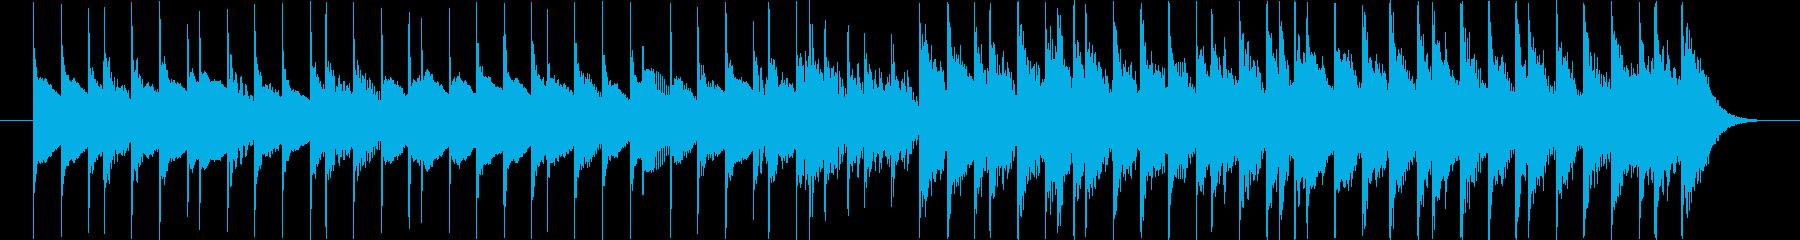 TV番組などで使えるポップな木琴ジングルの再生済みの波形